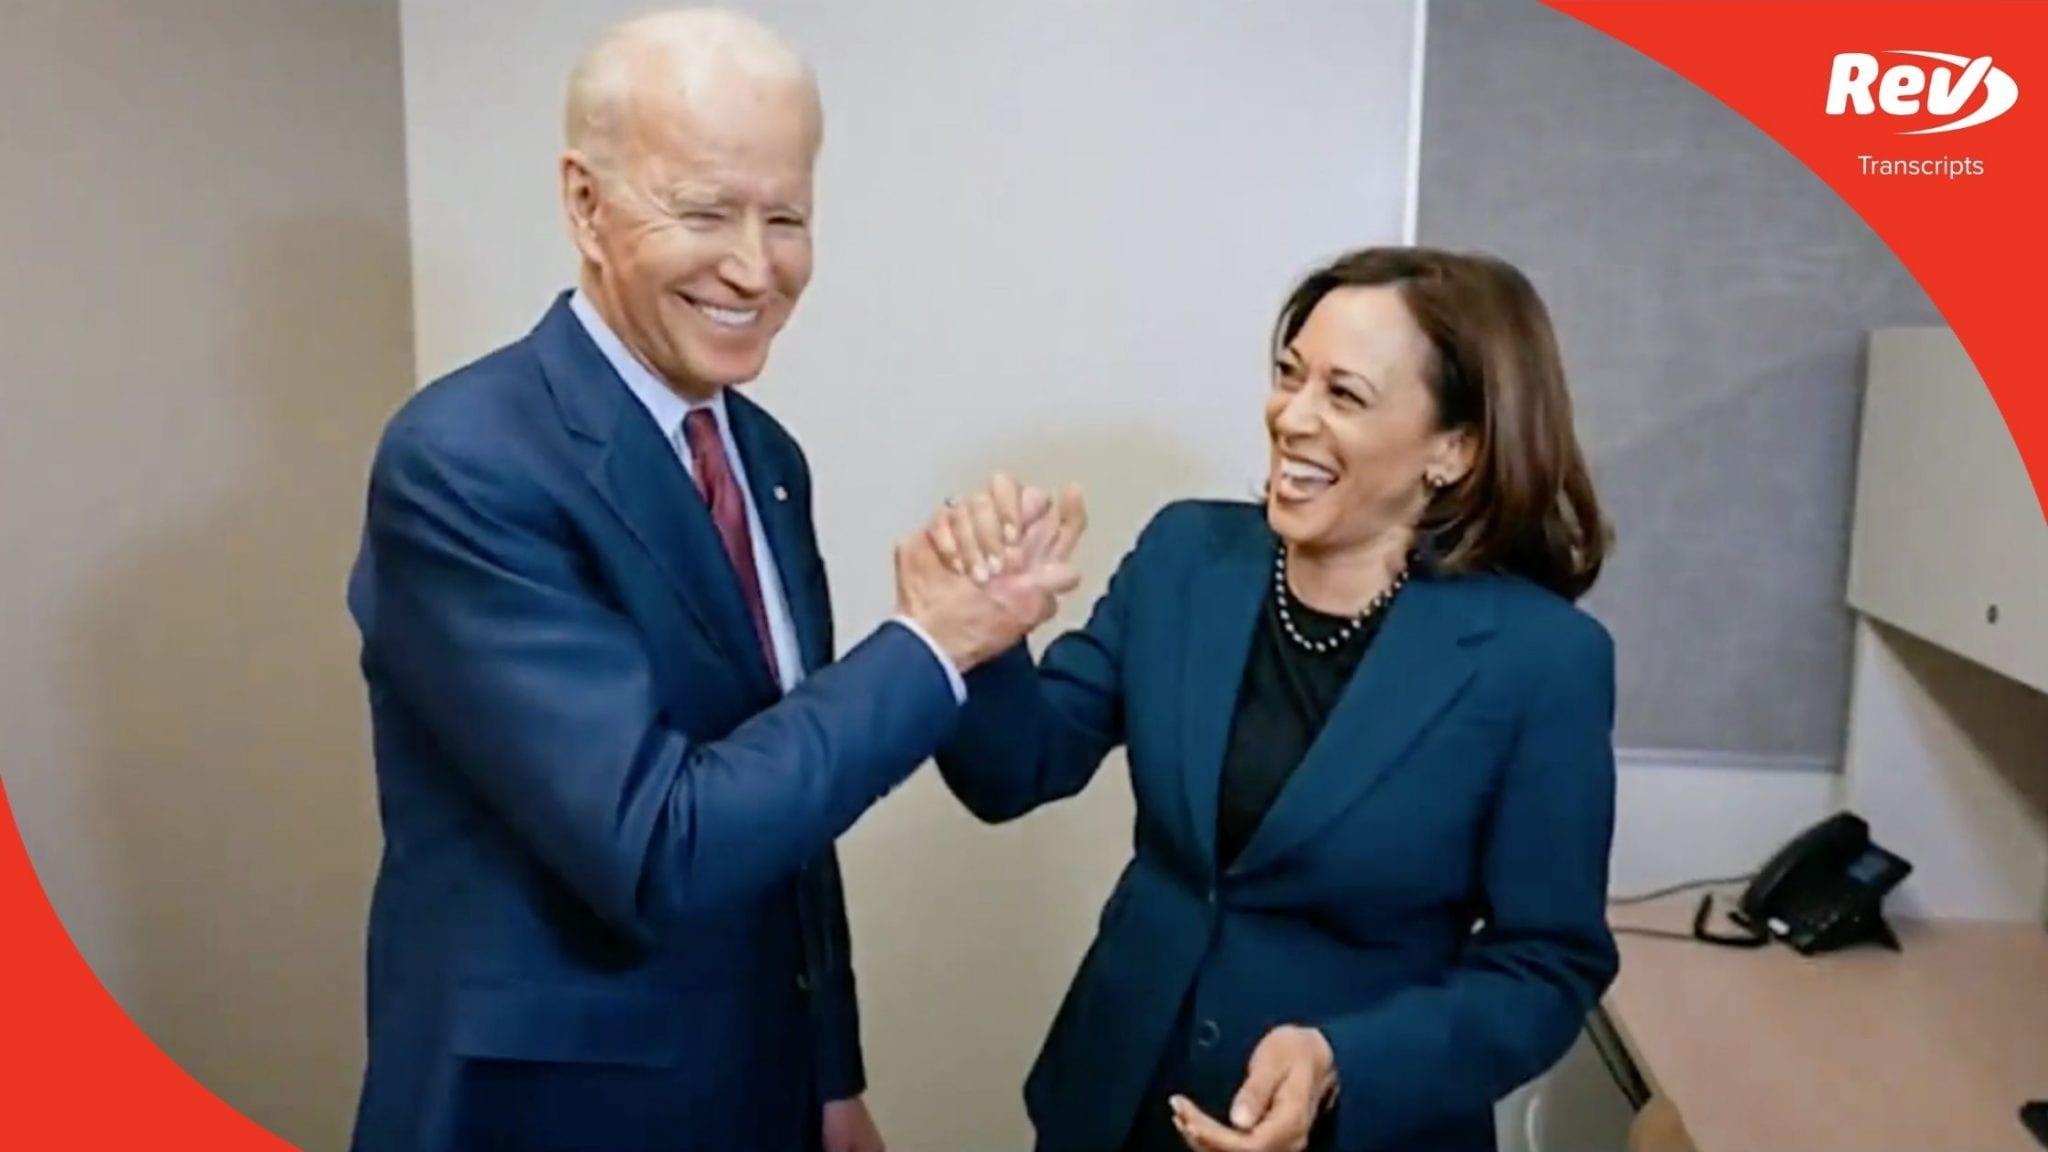 2020 Democratic National Convention (DNC) Night 4 Transcript